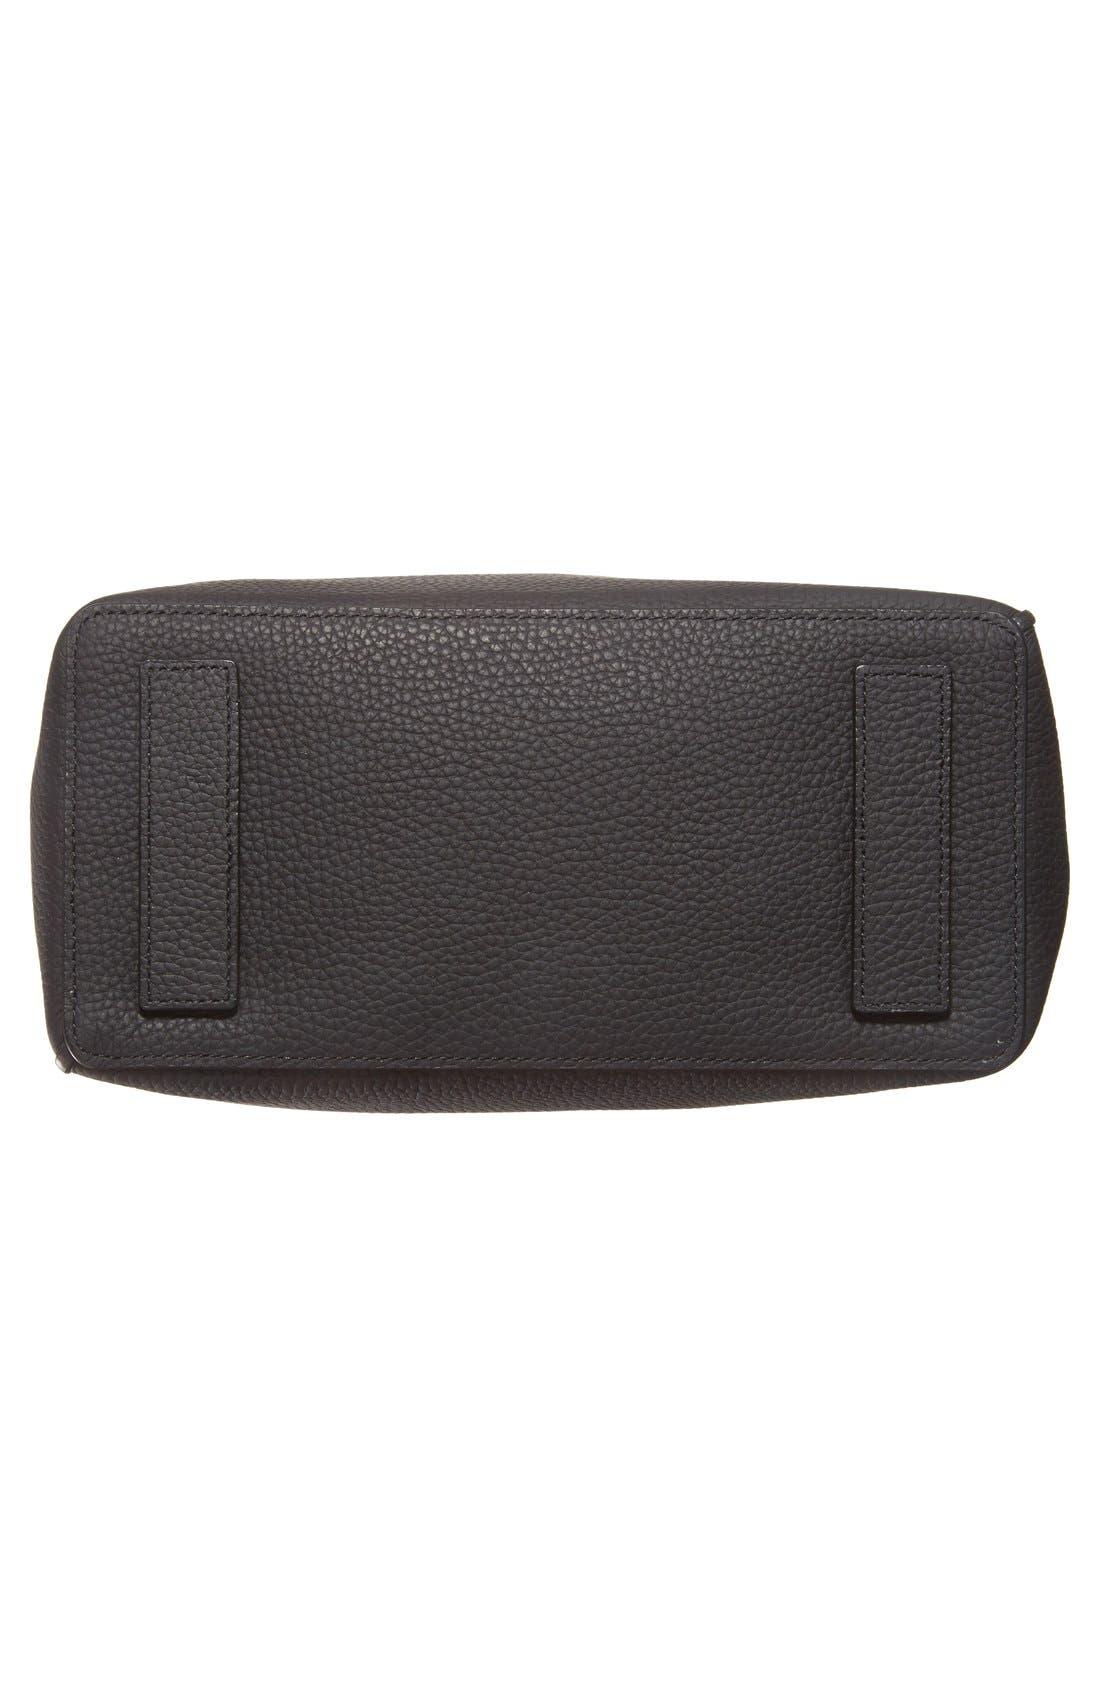 'Kita' Leather Shoulder/Crossbody Bag,                             Alternate thumbnail 6, color,                             BLACK